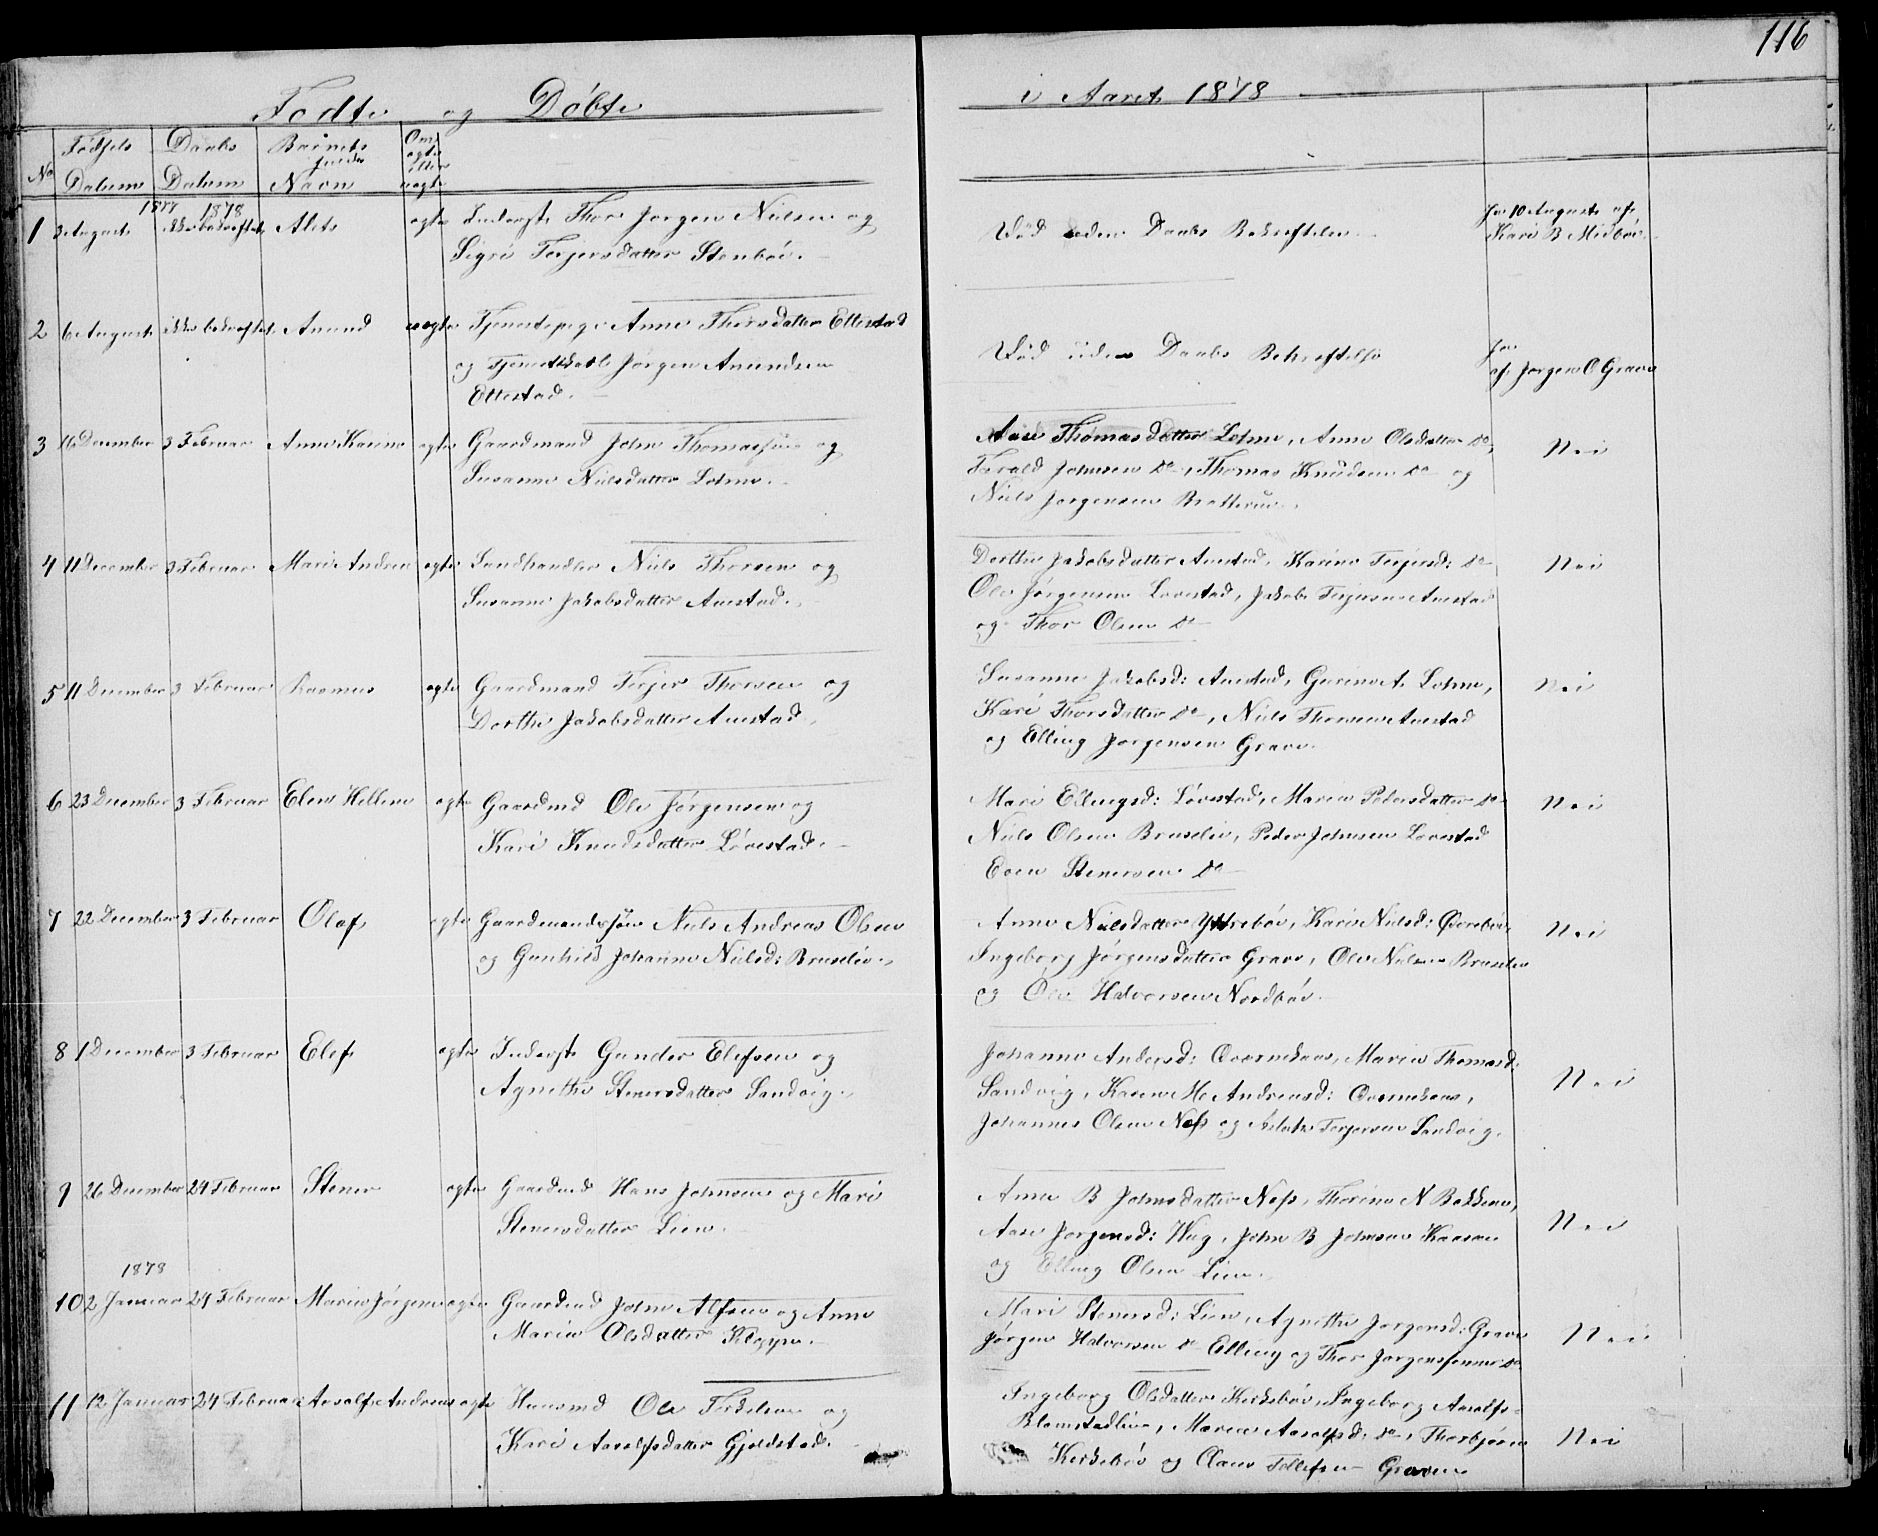 SAKO, Drangedal kirkebøker, G/Gb/L0001: Klokkerbok nr. II 1, 1856-1894, s. 116